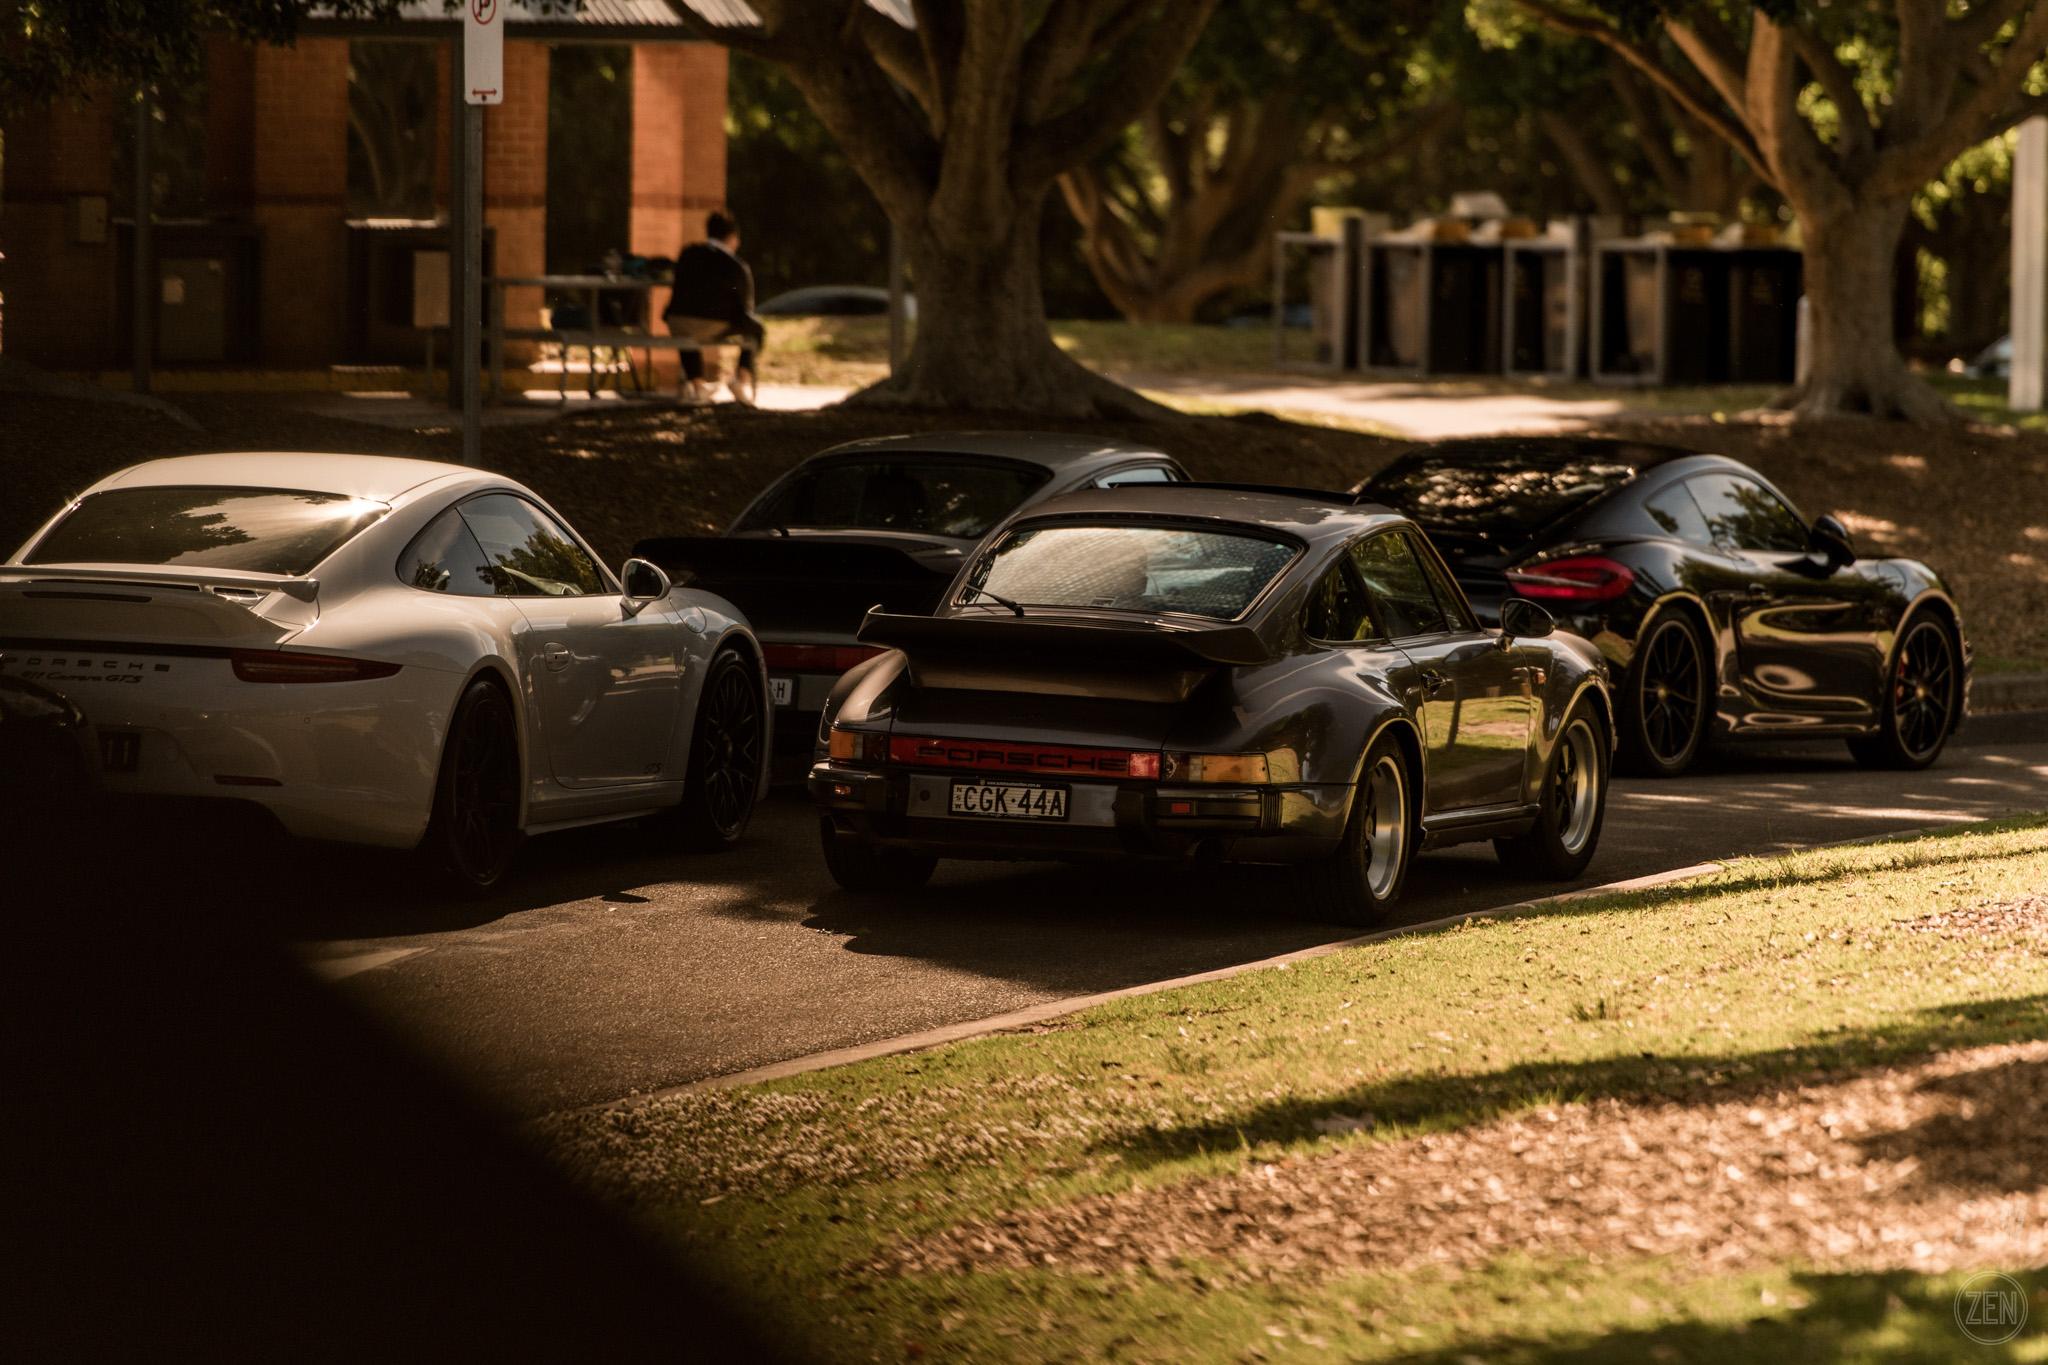 2019-10-27 - Autohaus Porsches & Coffee 155